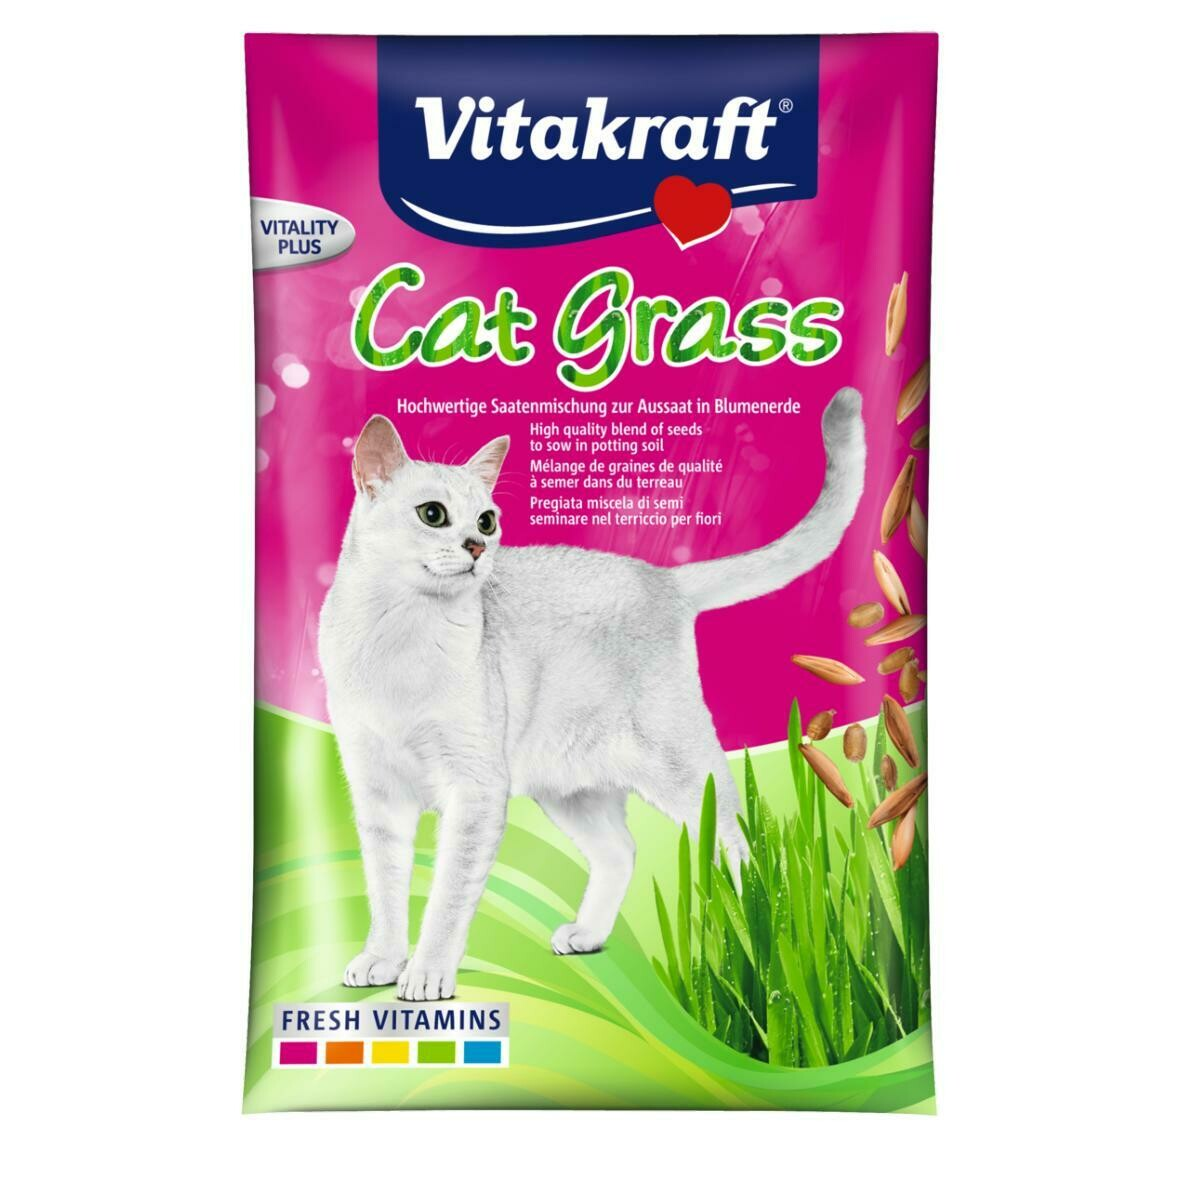 Vitakraft Cat Grass Refill